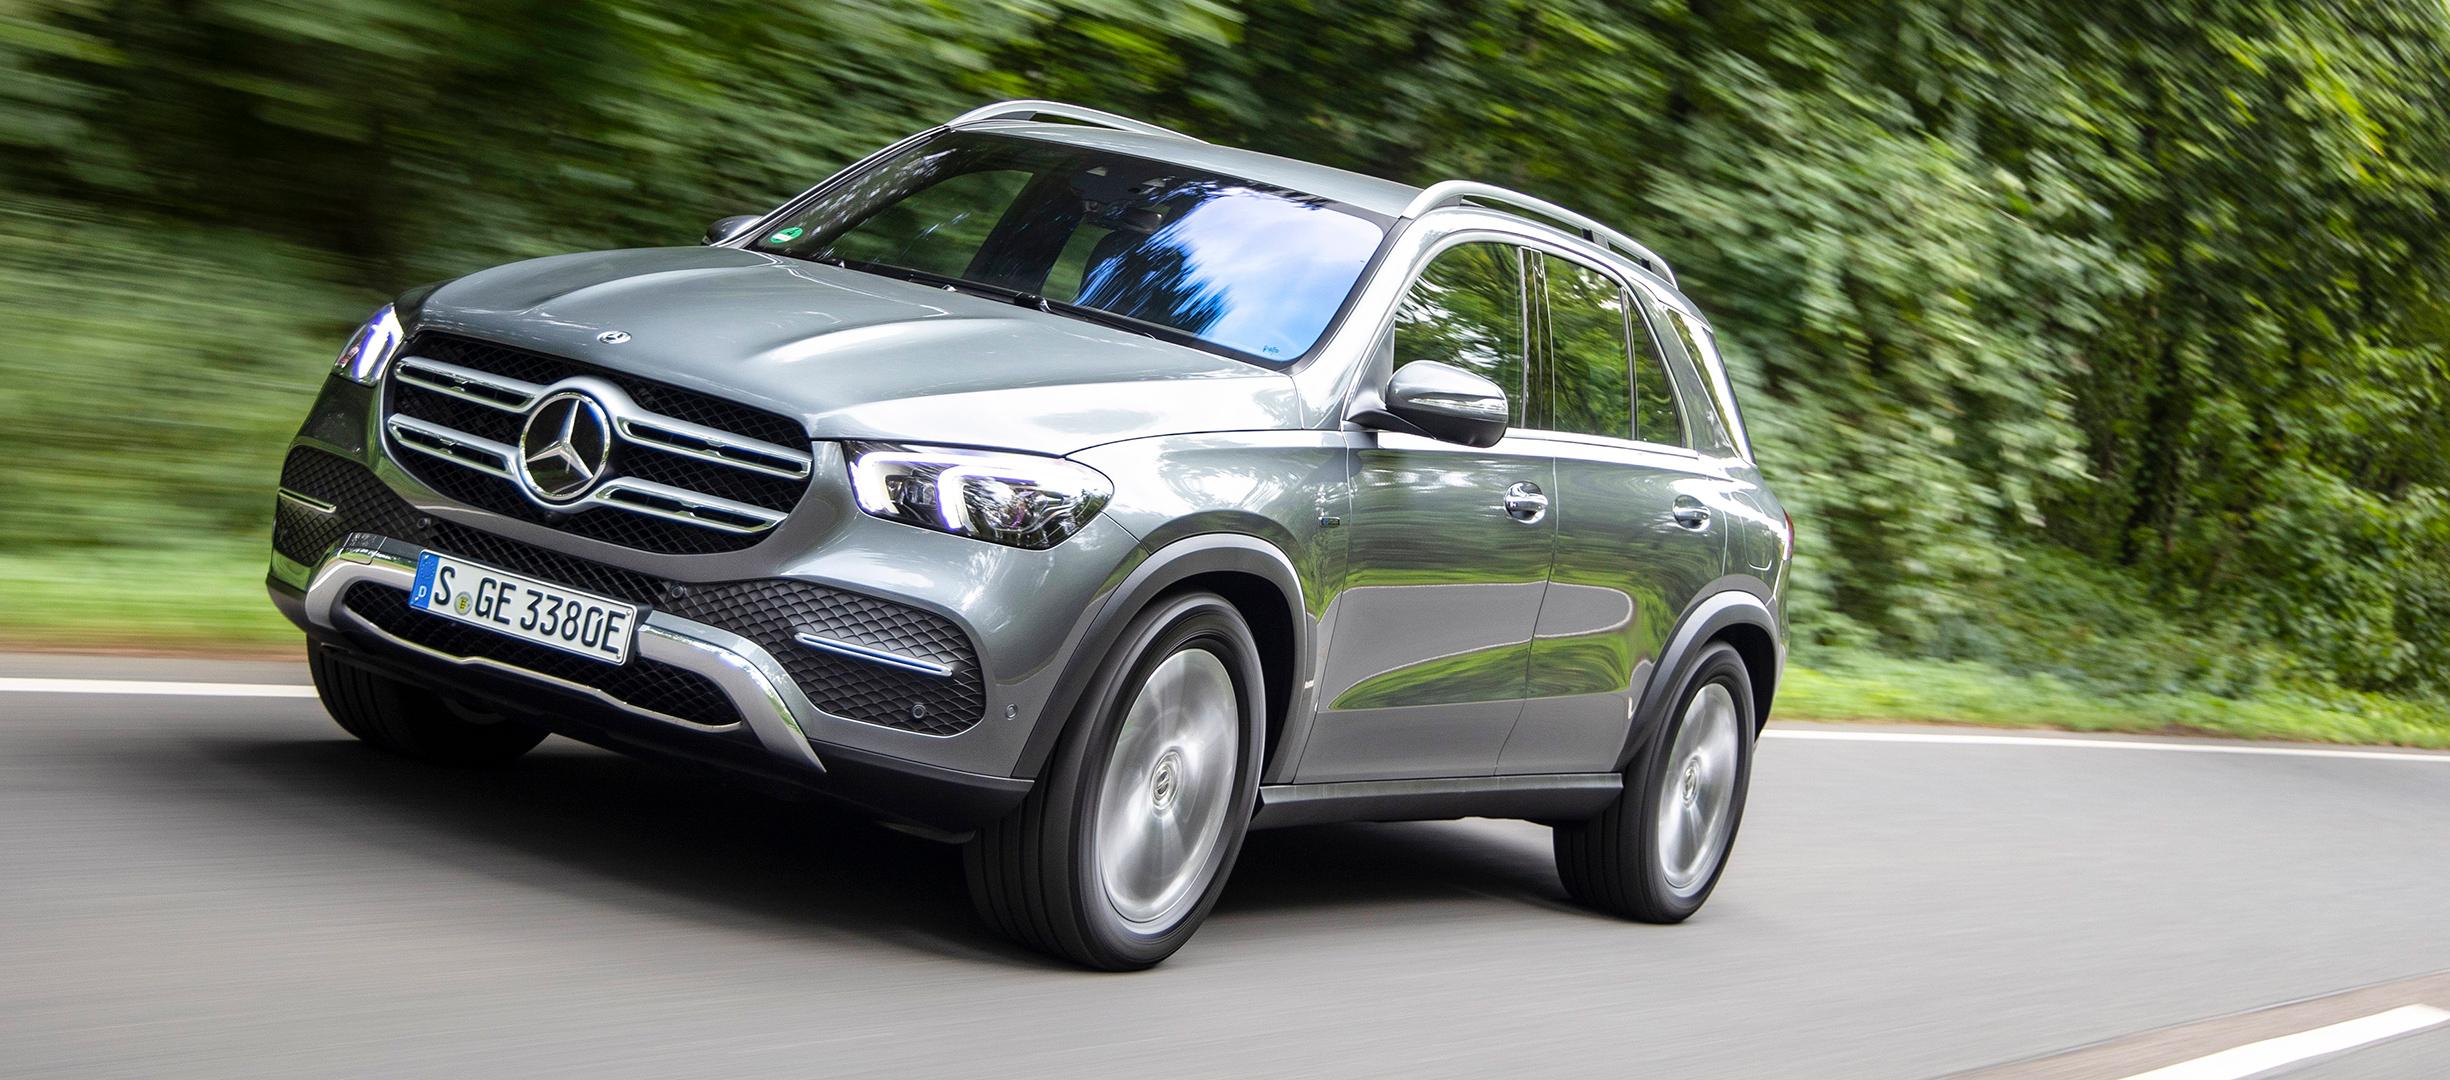 Ya se admiten pedidos del Mercedes-Benz GLE 350 de 4MATIC